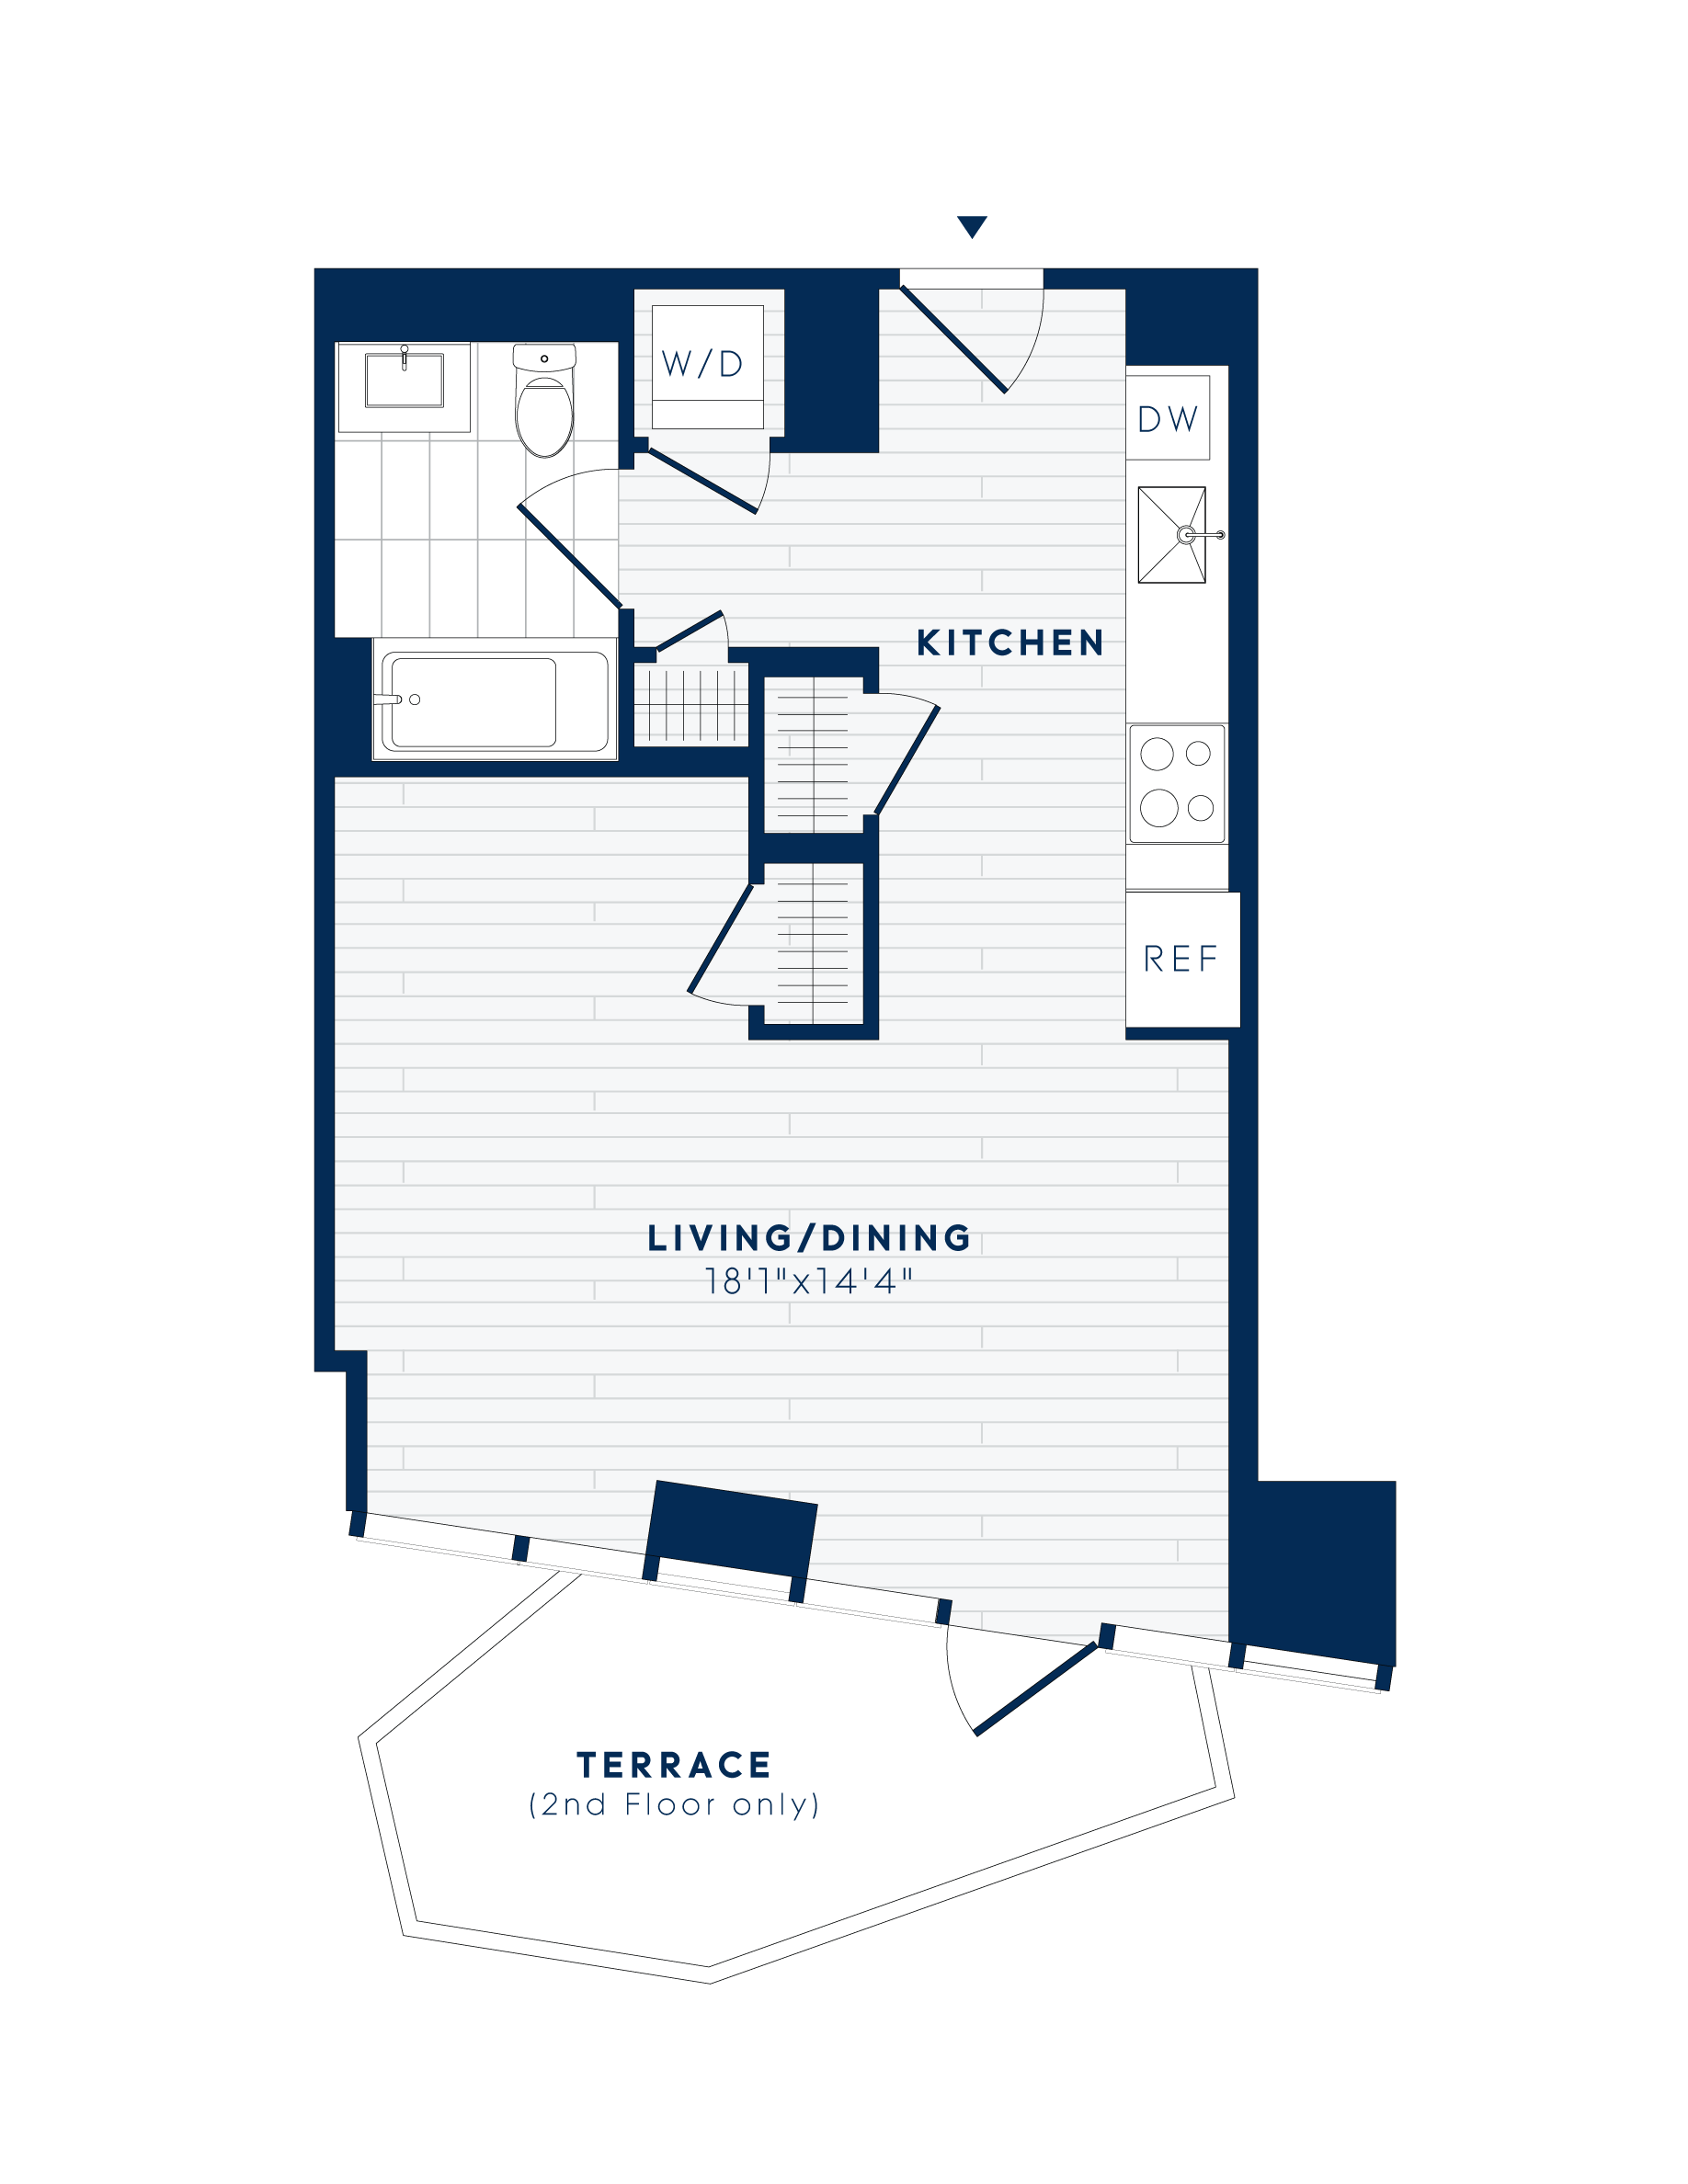 floor plan image of apartment 513